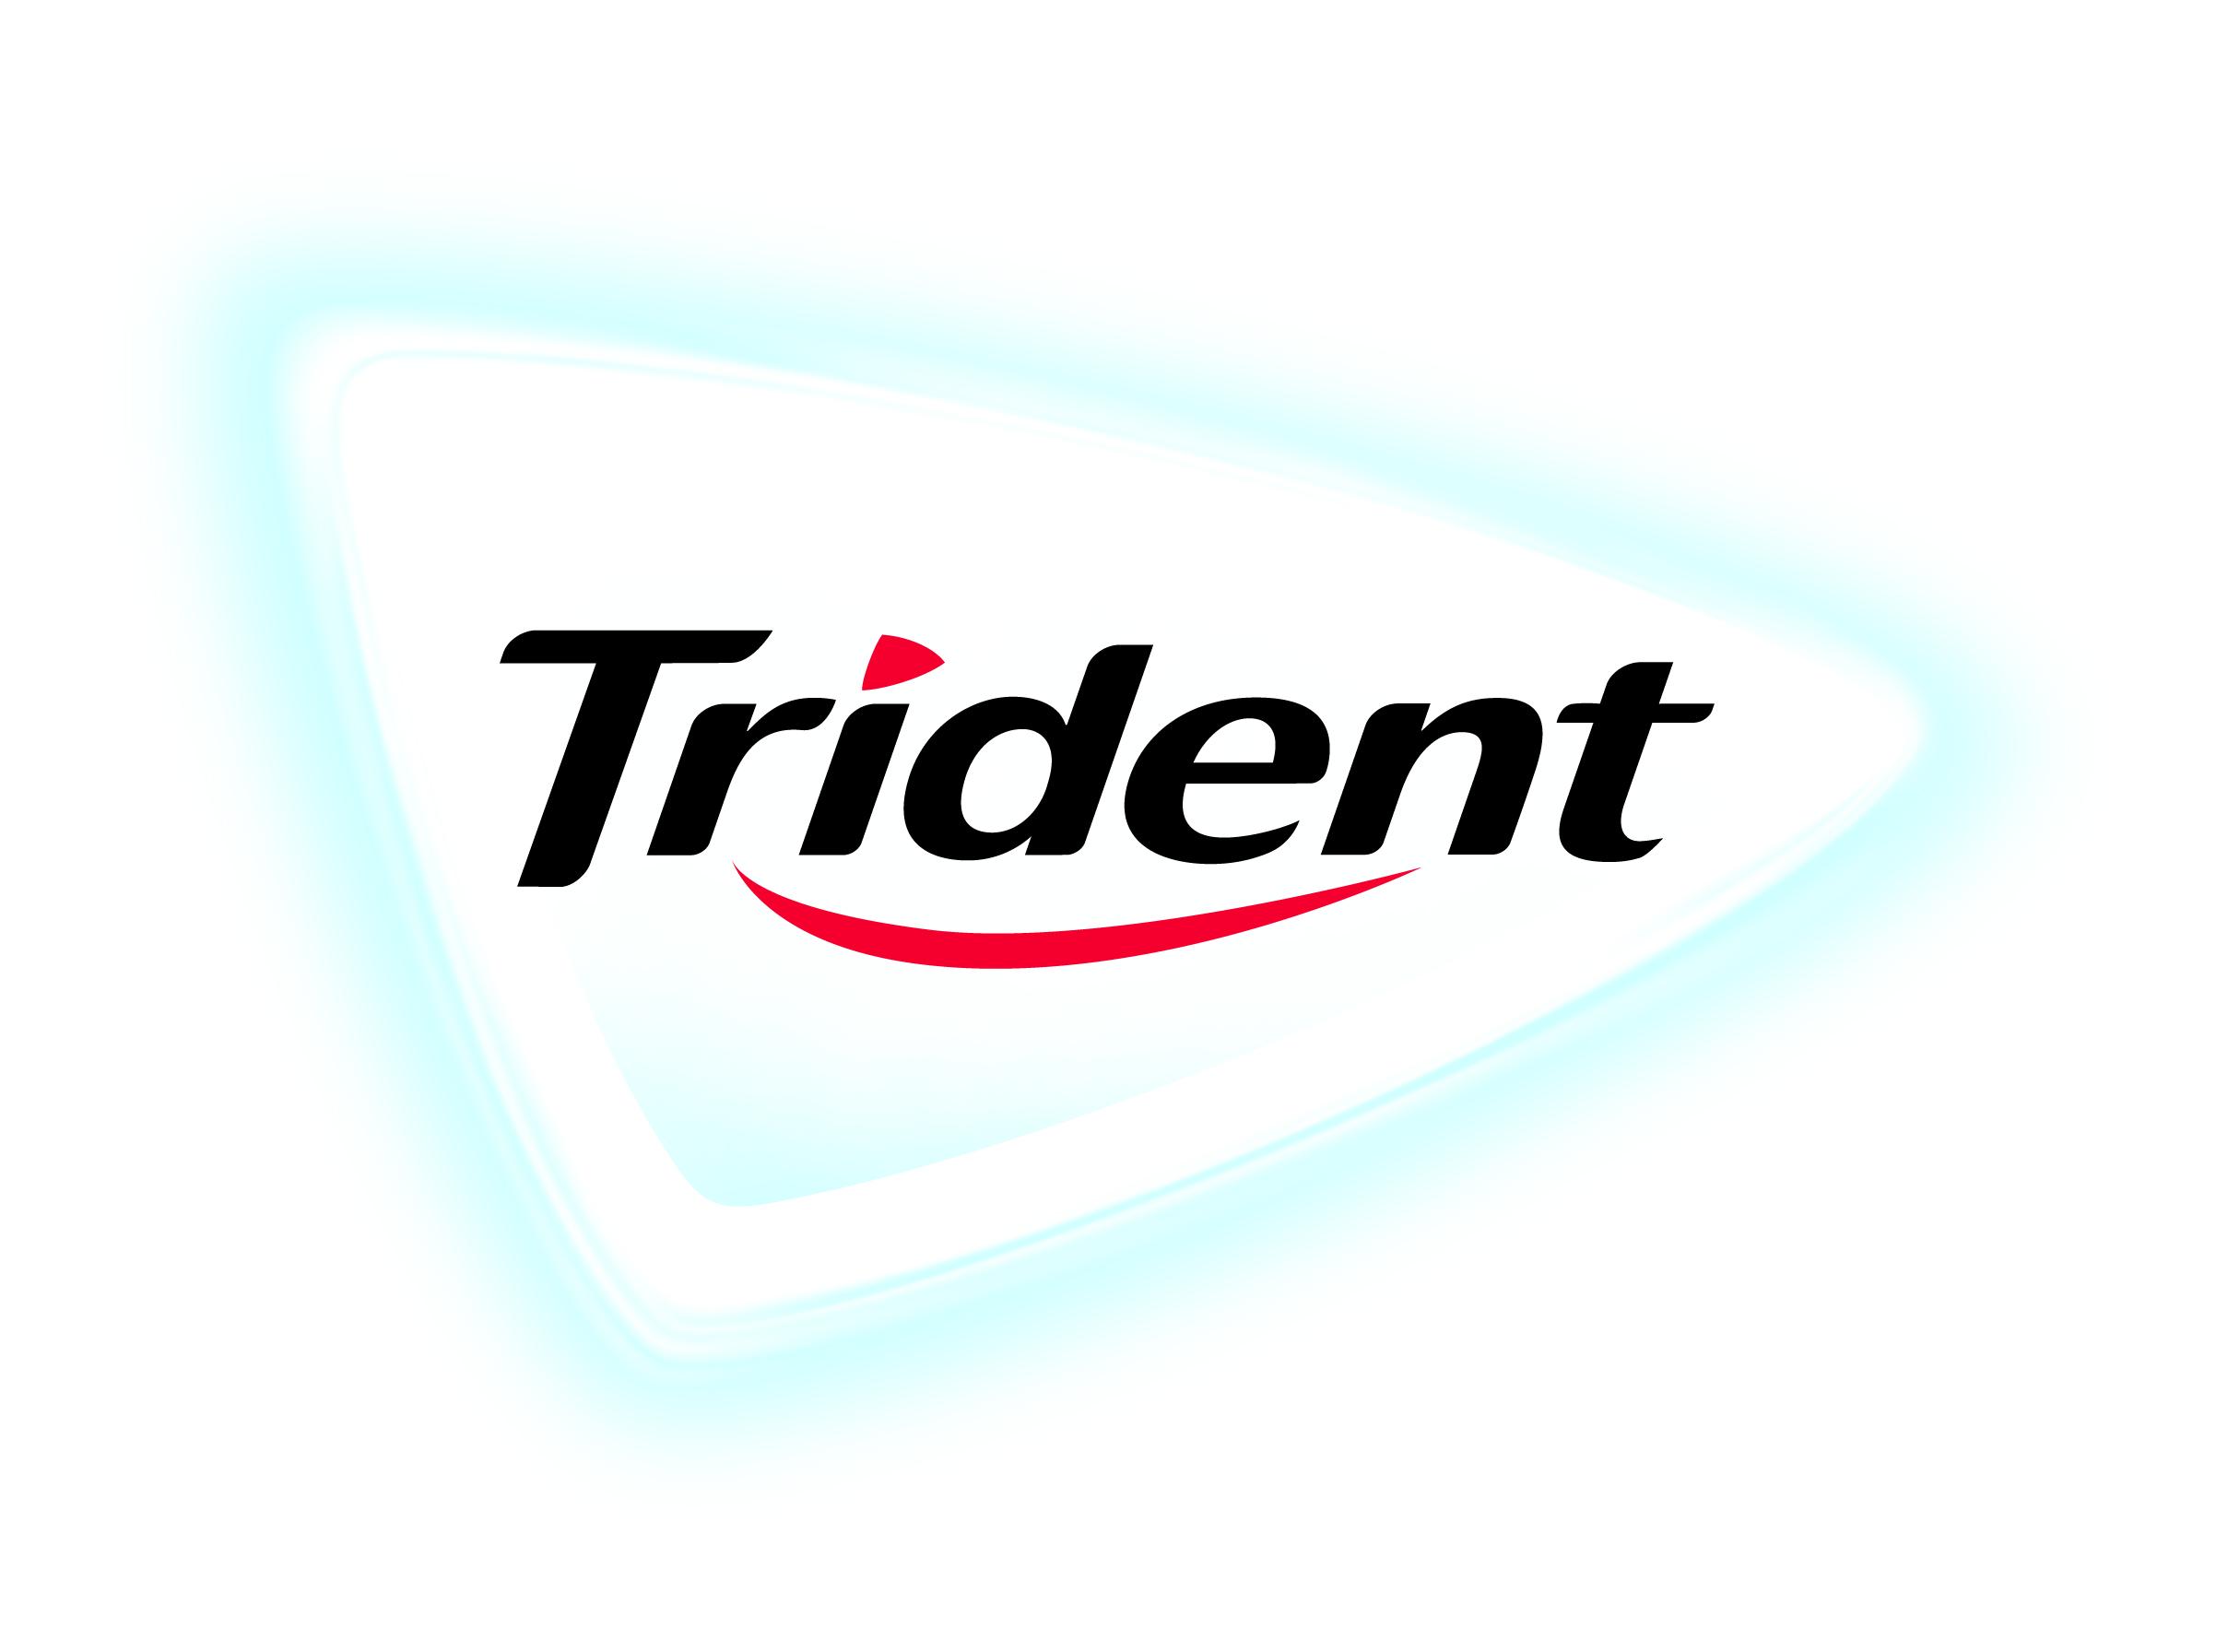 How Trident Gum Promotes #HealthySmiles. sponsored